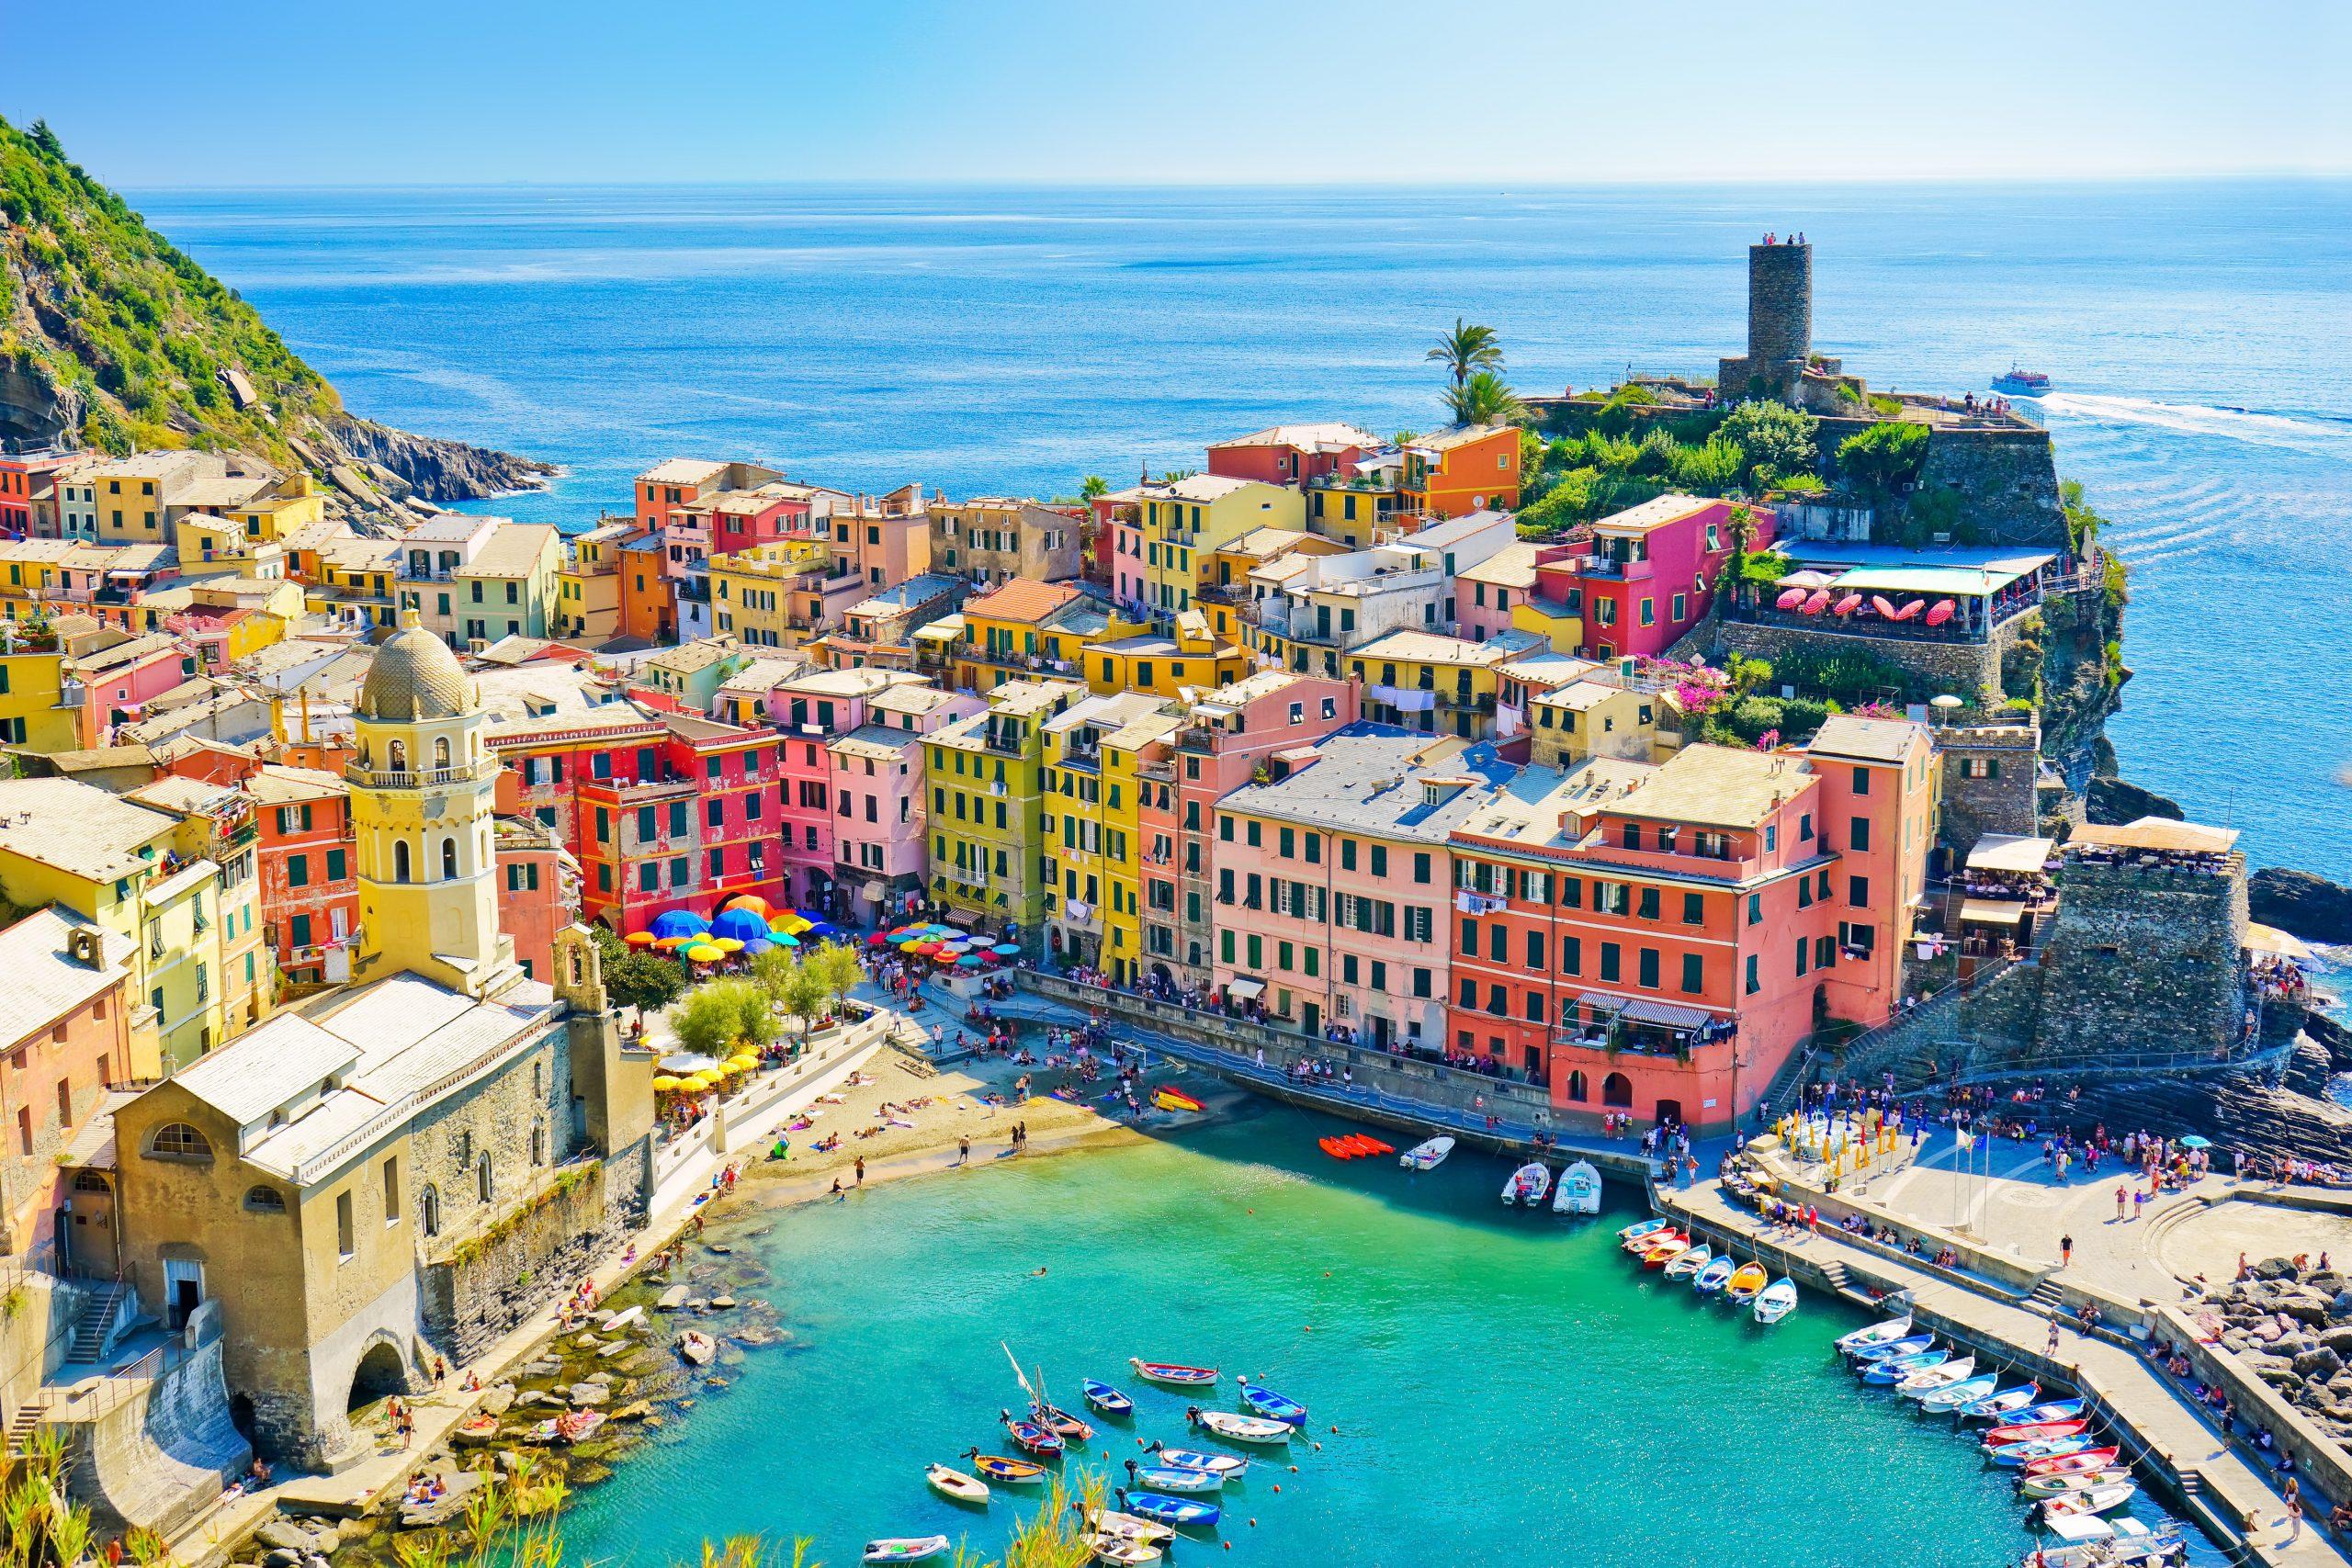 Plaże w Cinque Terre, fot. shutterstock.com